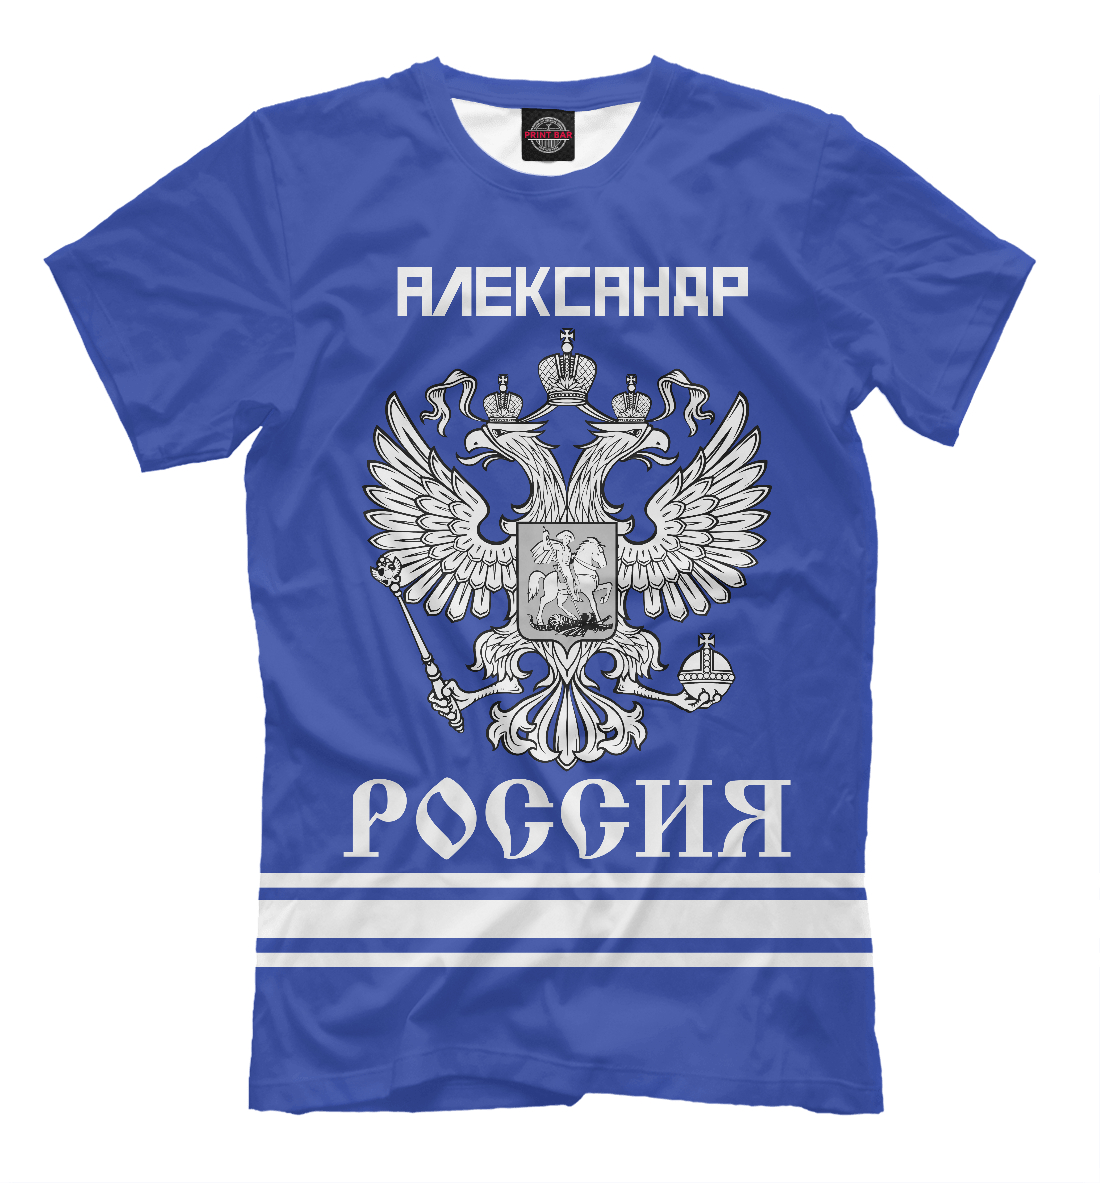 Купить АЛЕКСАНДР sport russia collection, Printbar, Футболки, ALS-562578-fut-2